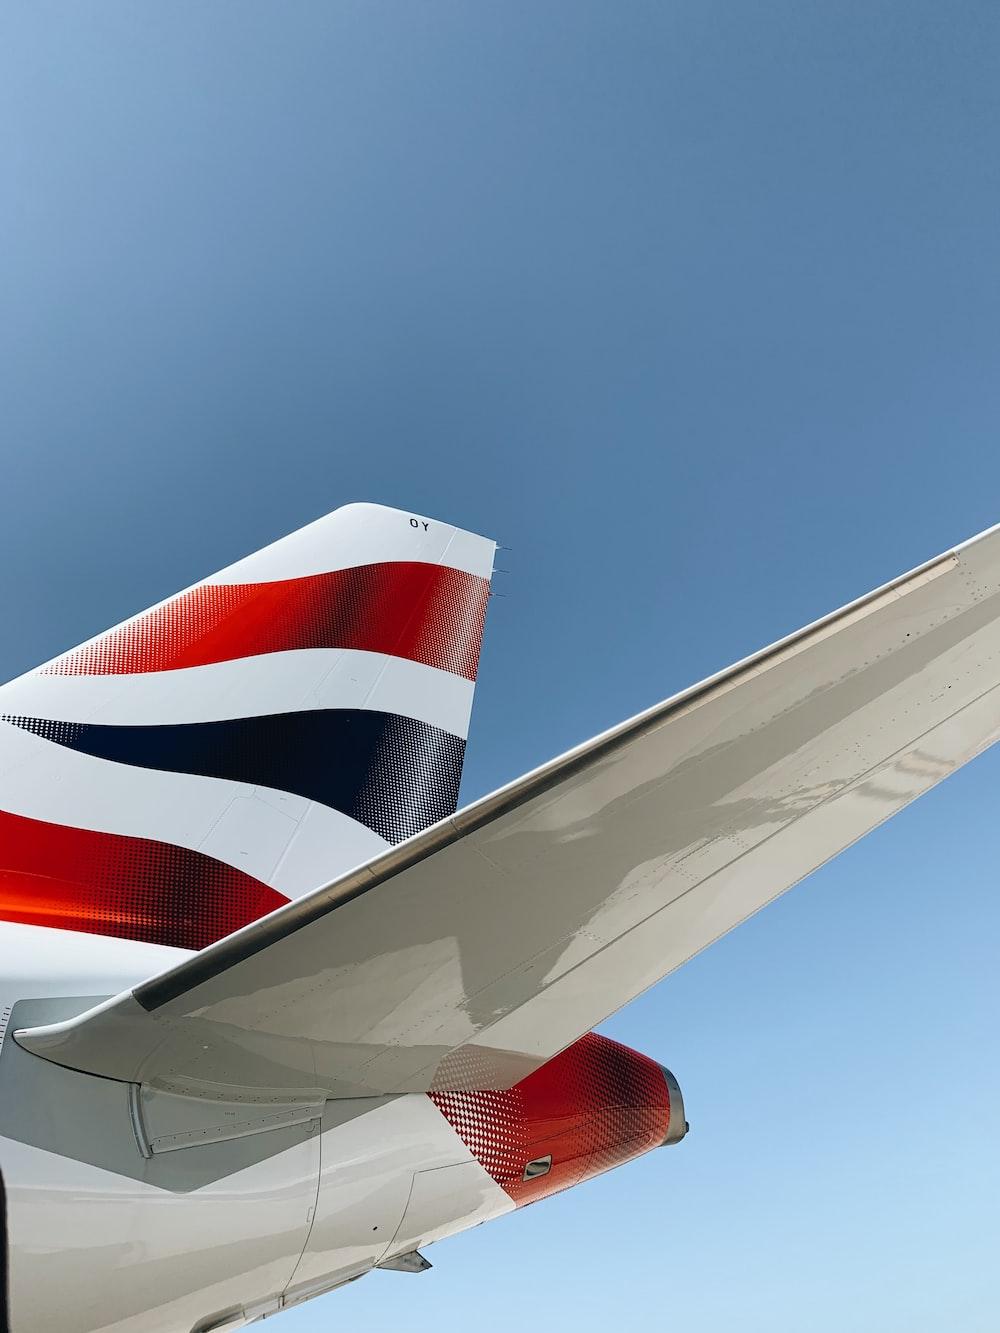 us a flag on white plane